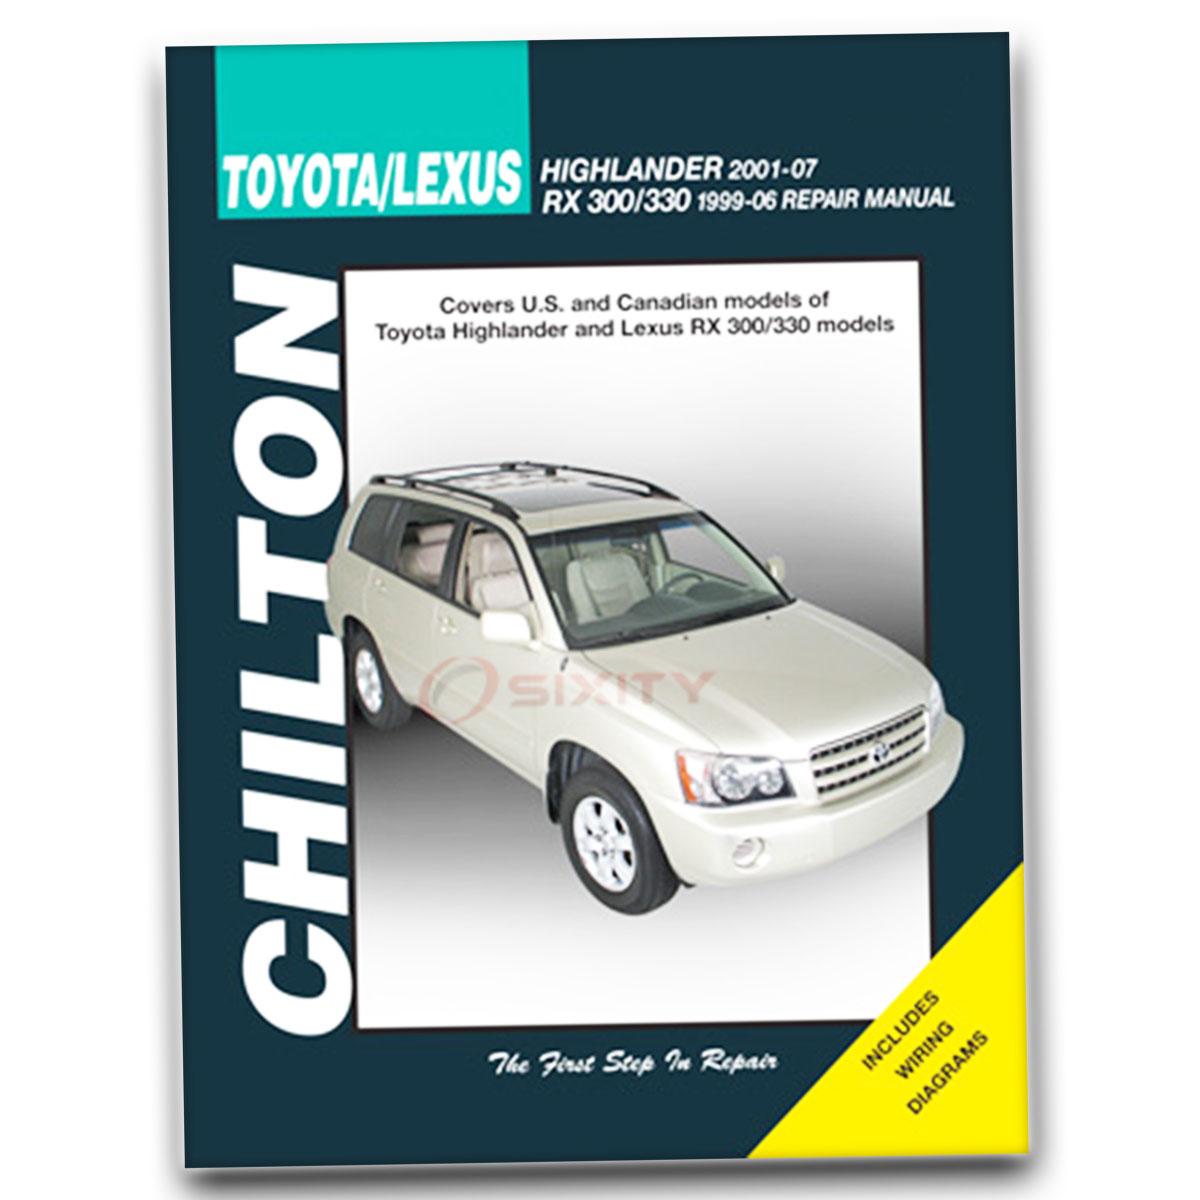 Chilton Repair Manual 68354 for Toyota Highlander 2001-07 Lexus RX 300 330  ud